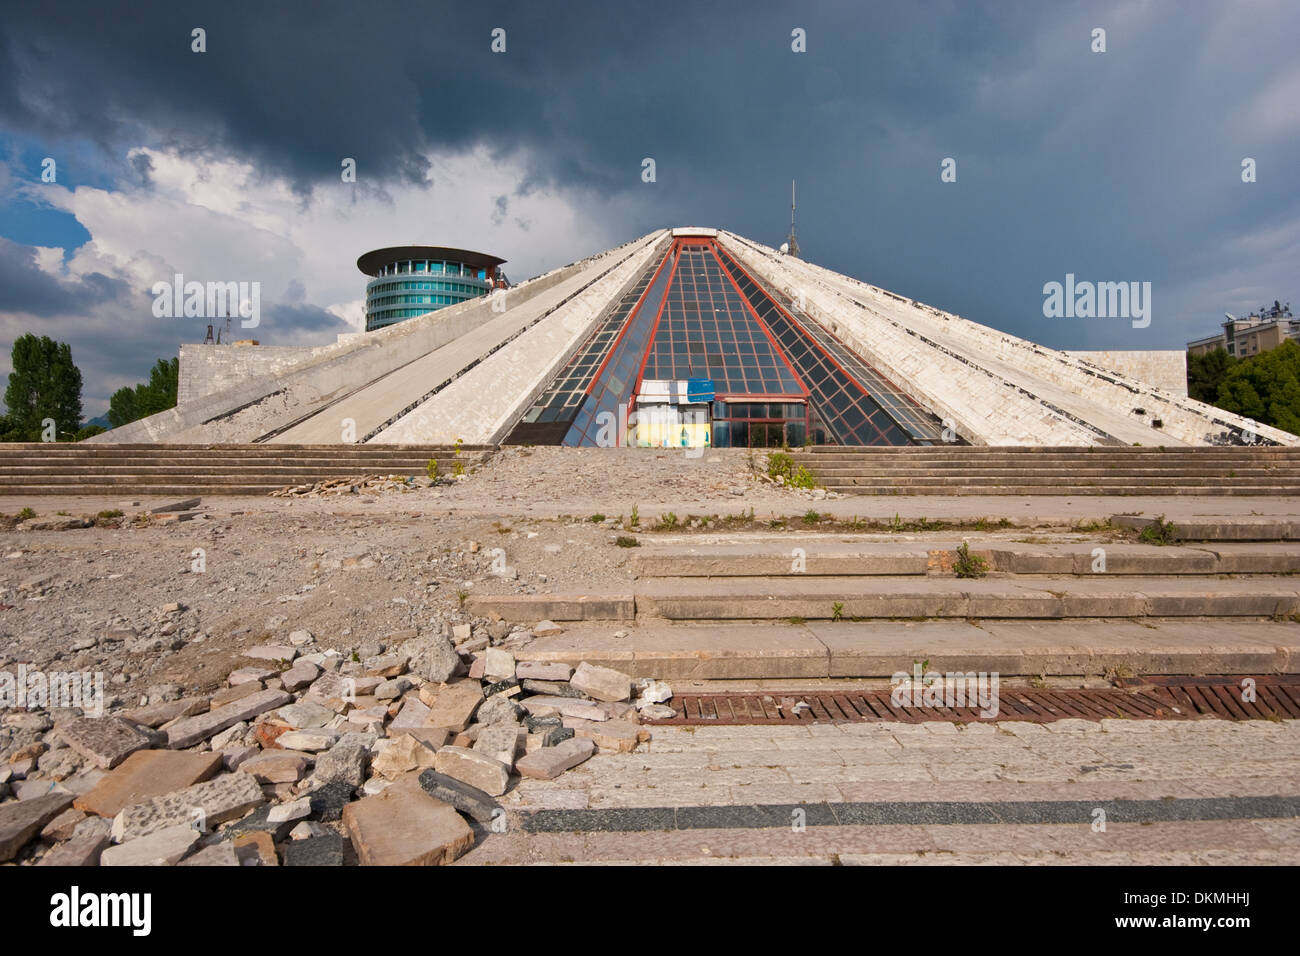 Enver Hoxha Museum, Tirana, Albania - Stock Image